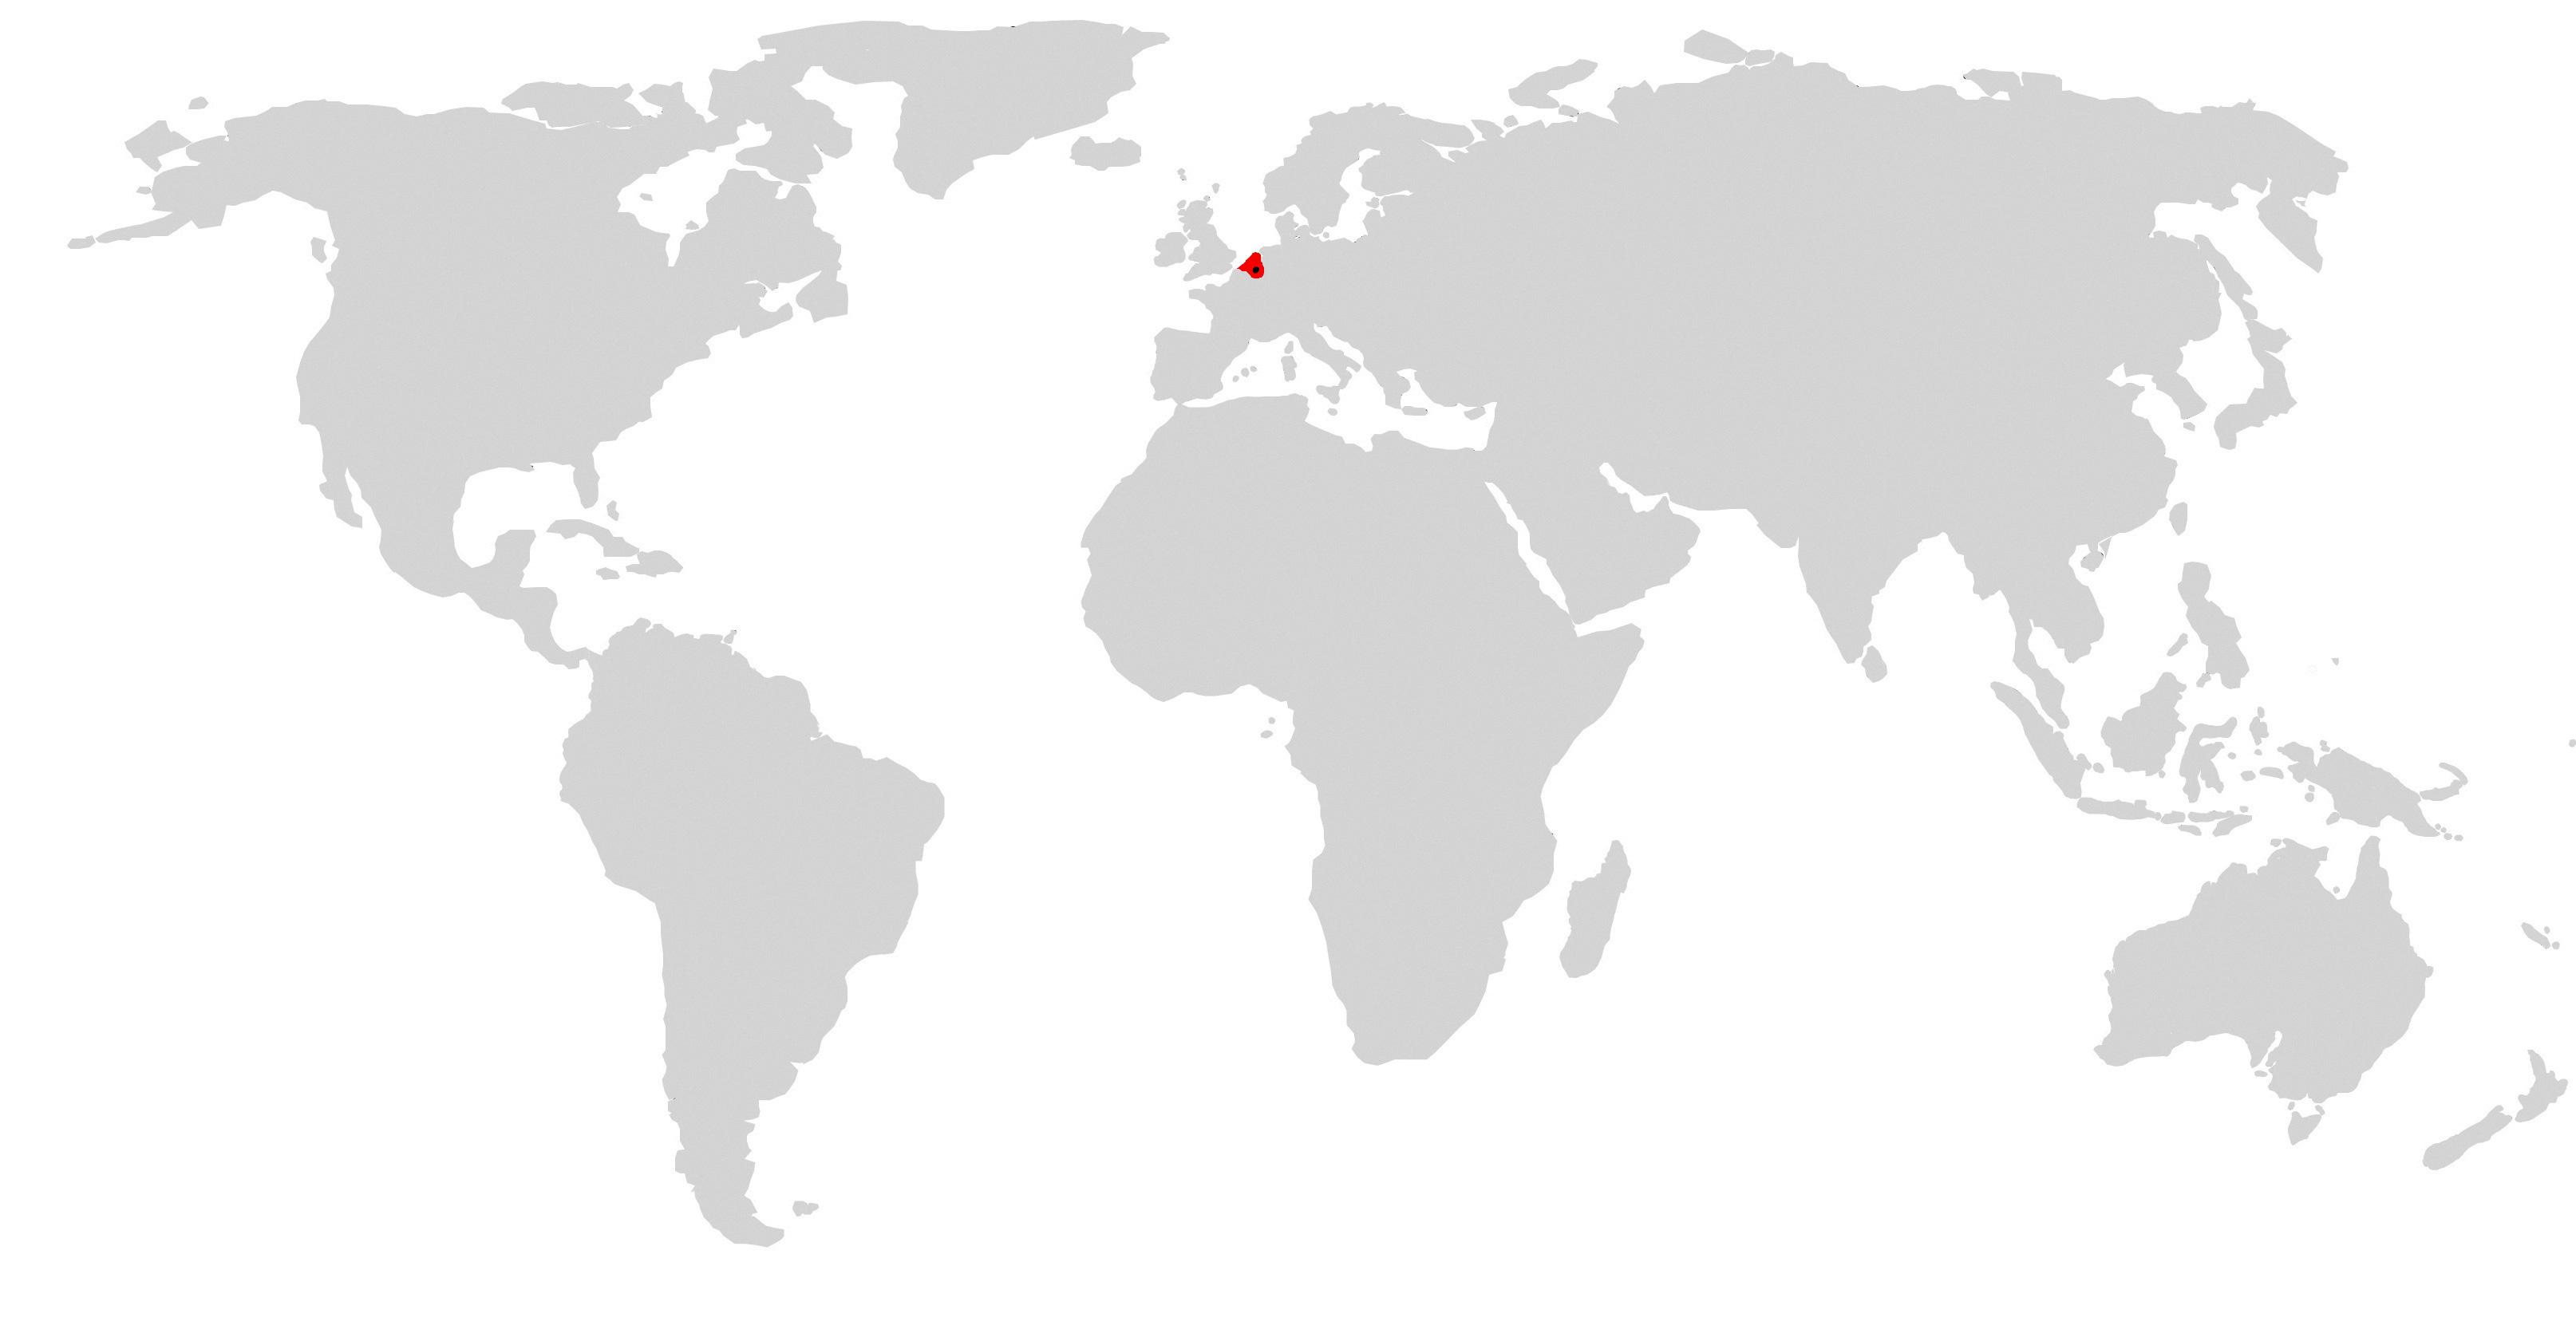 mapa-paises-bajos